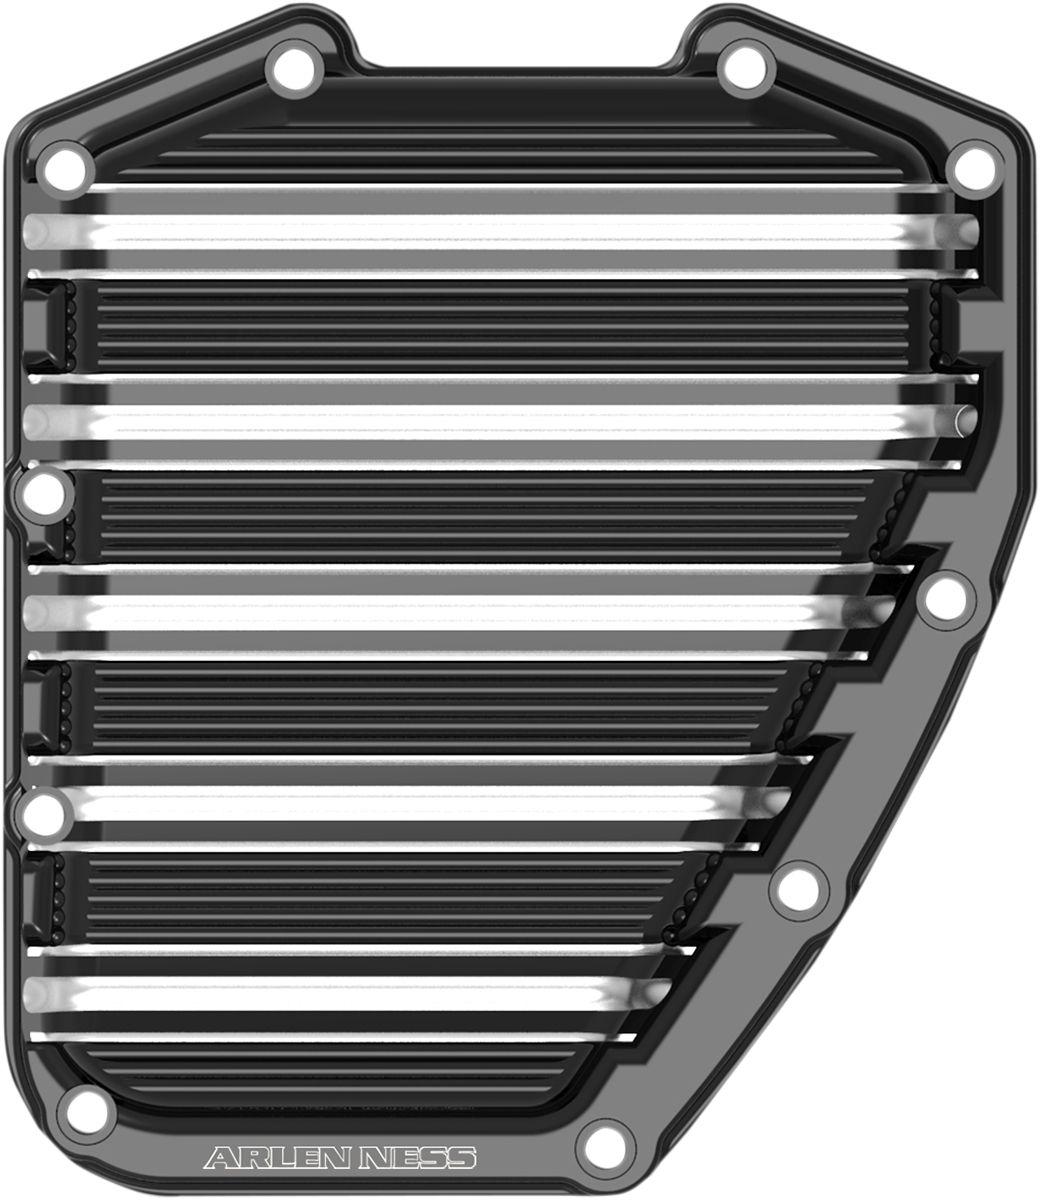 【ARLEN NESS】凸輪蓋 煞車油壺蓋 CAM 10 壓力錶 - 「Webike-摩托百貨」